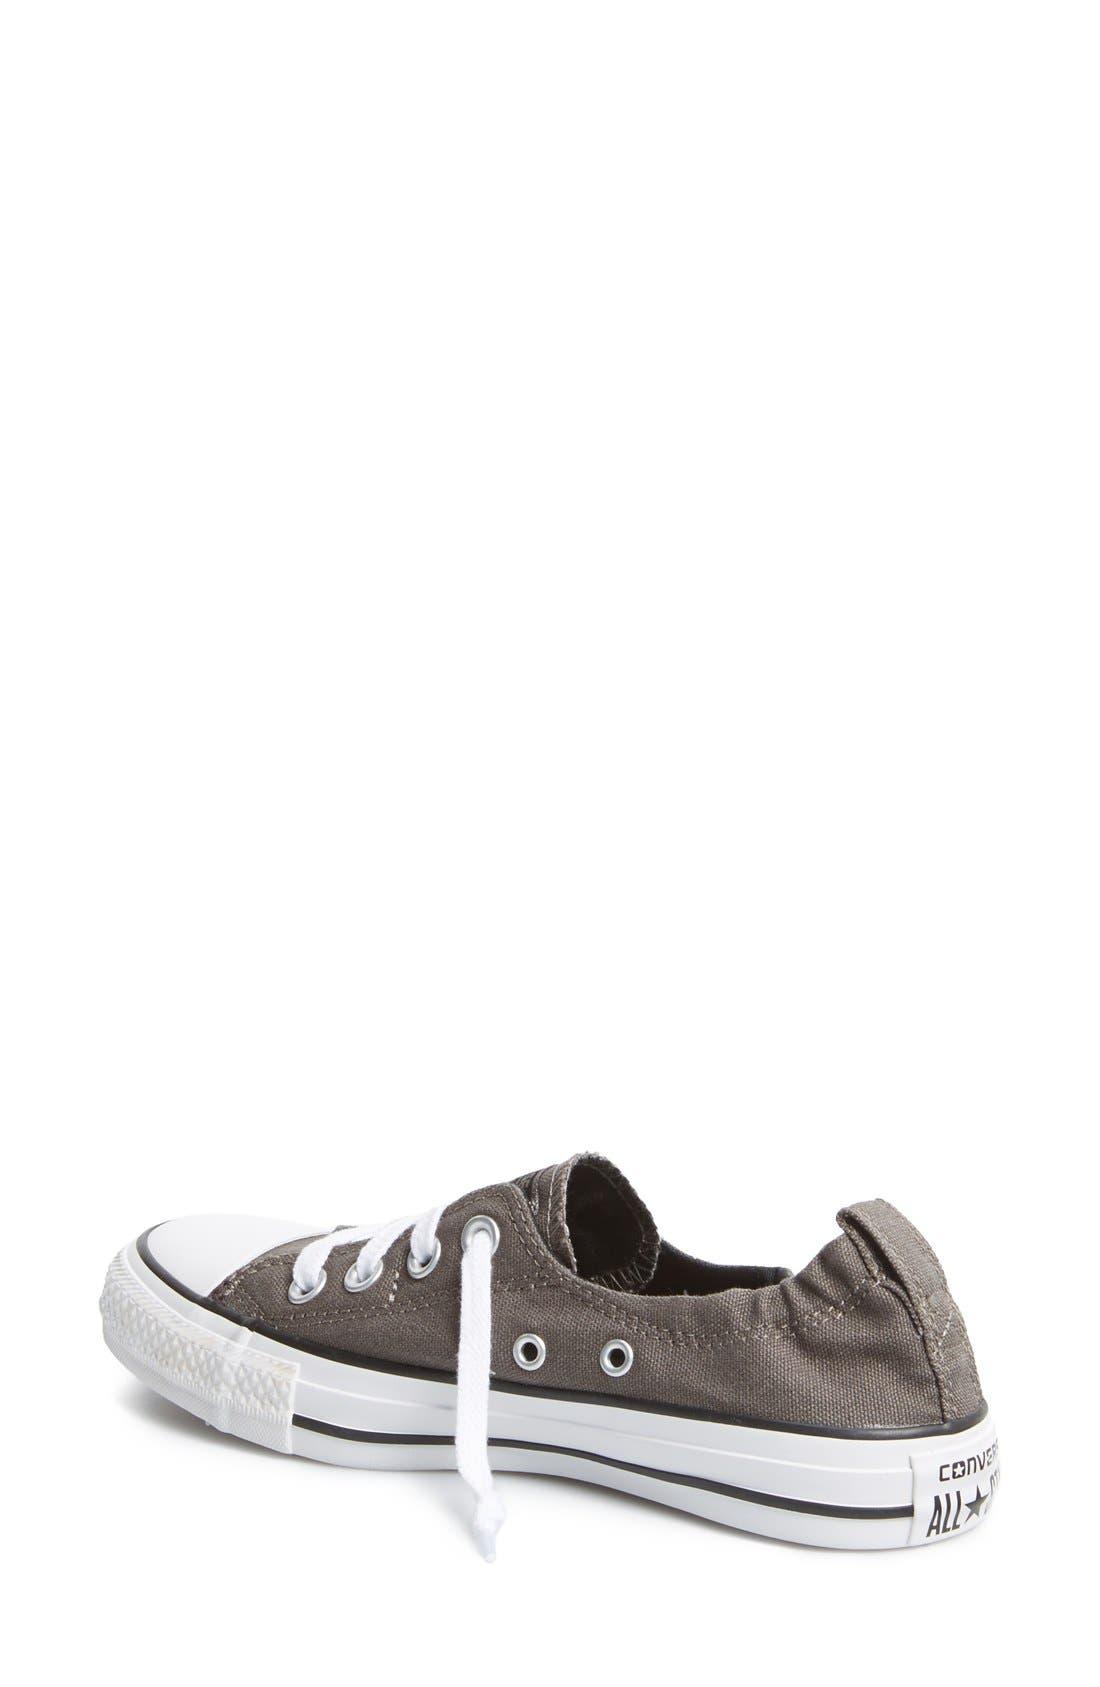 Alternate Image 2  - Converse Chuck Taylor® All Star® Shoreline Low Top Sneaker (Women)